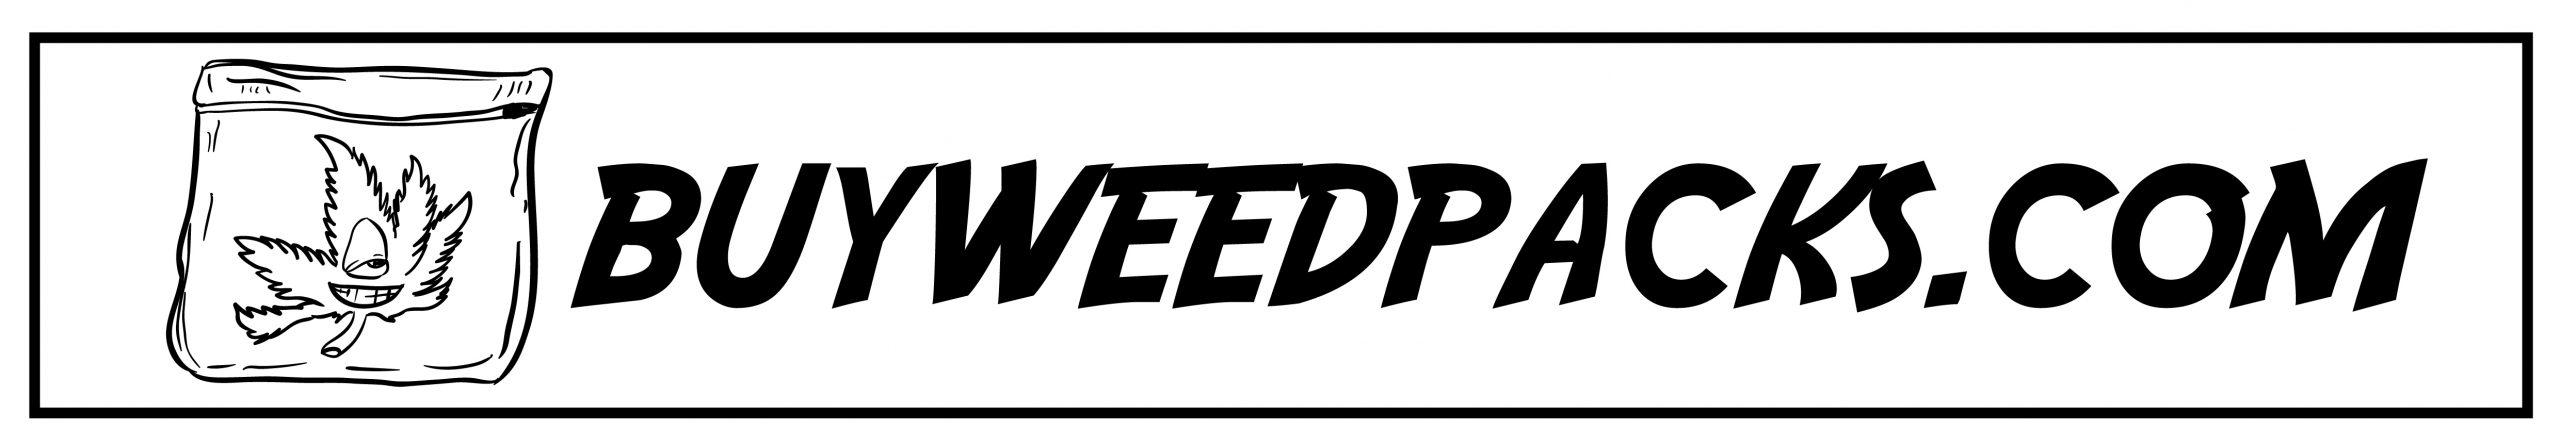 Online Dispensary Canada | Buy Online Weeds | Buyweedpacks